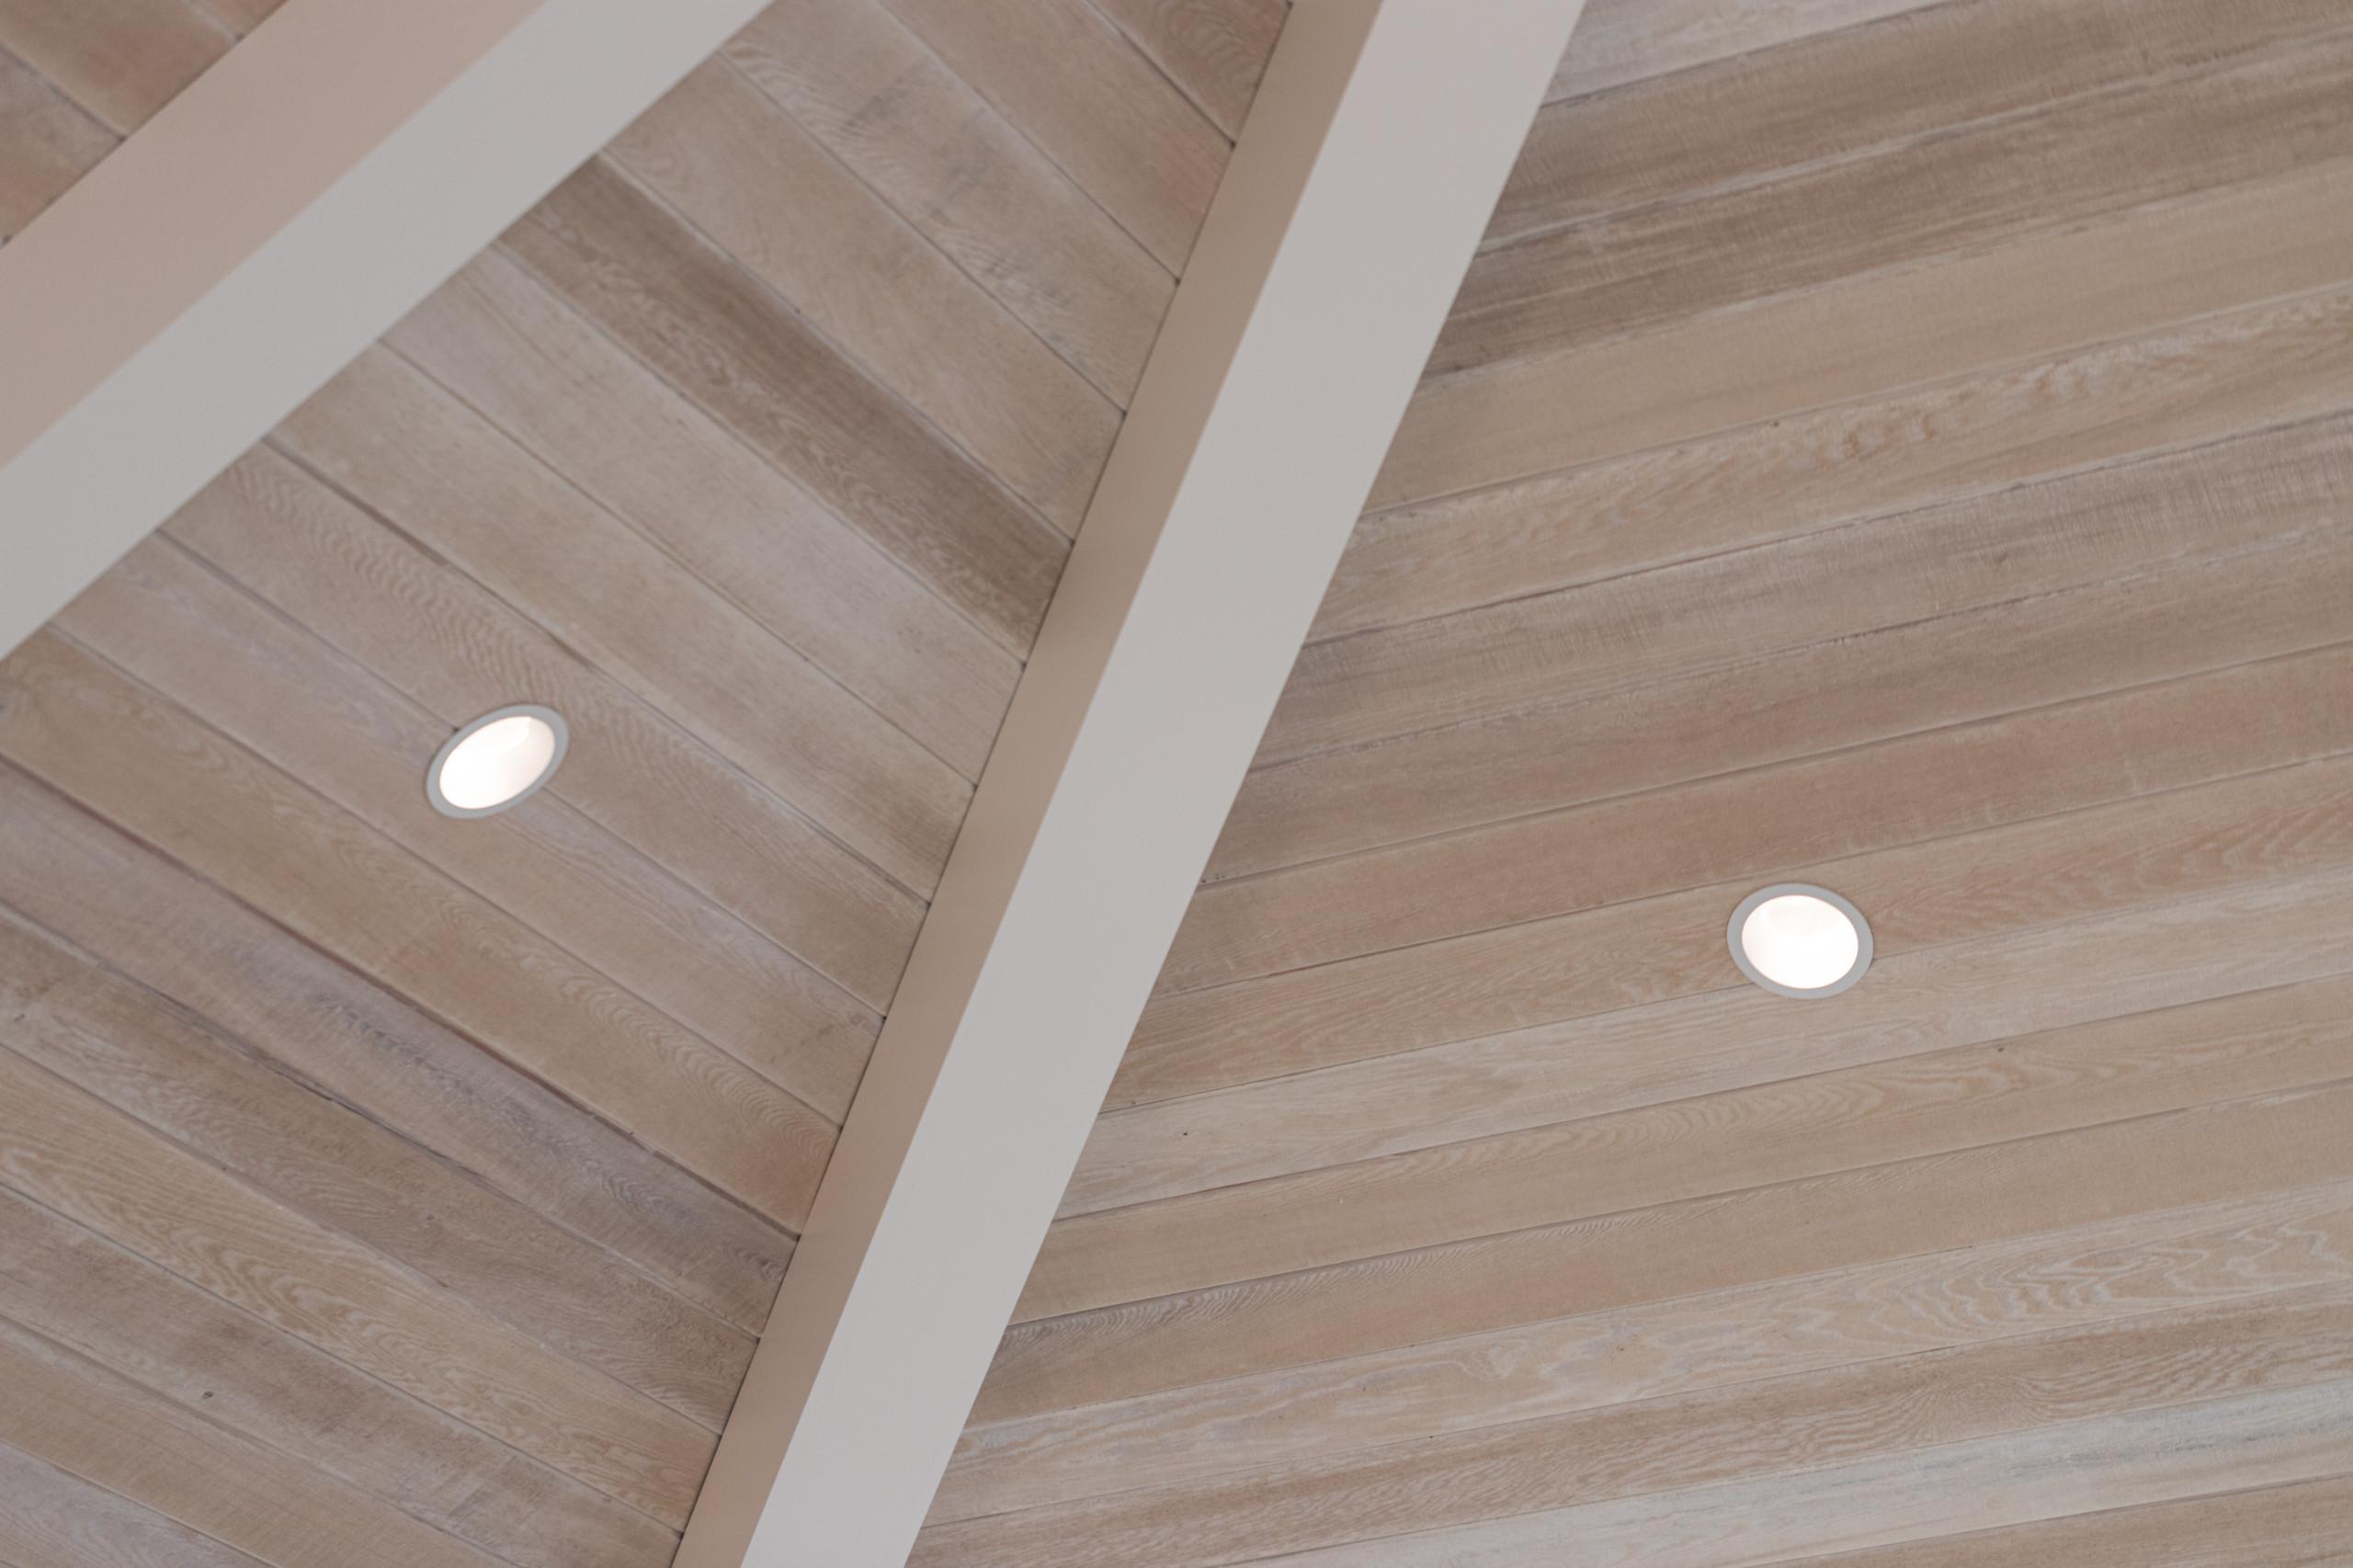 vaulted ceiling, beachy whitewash finish